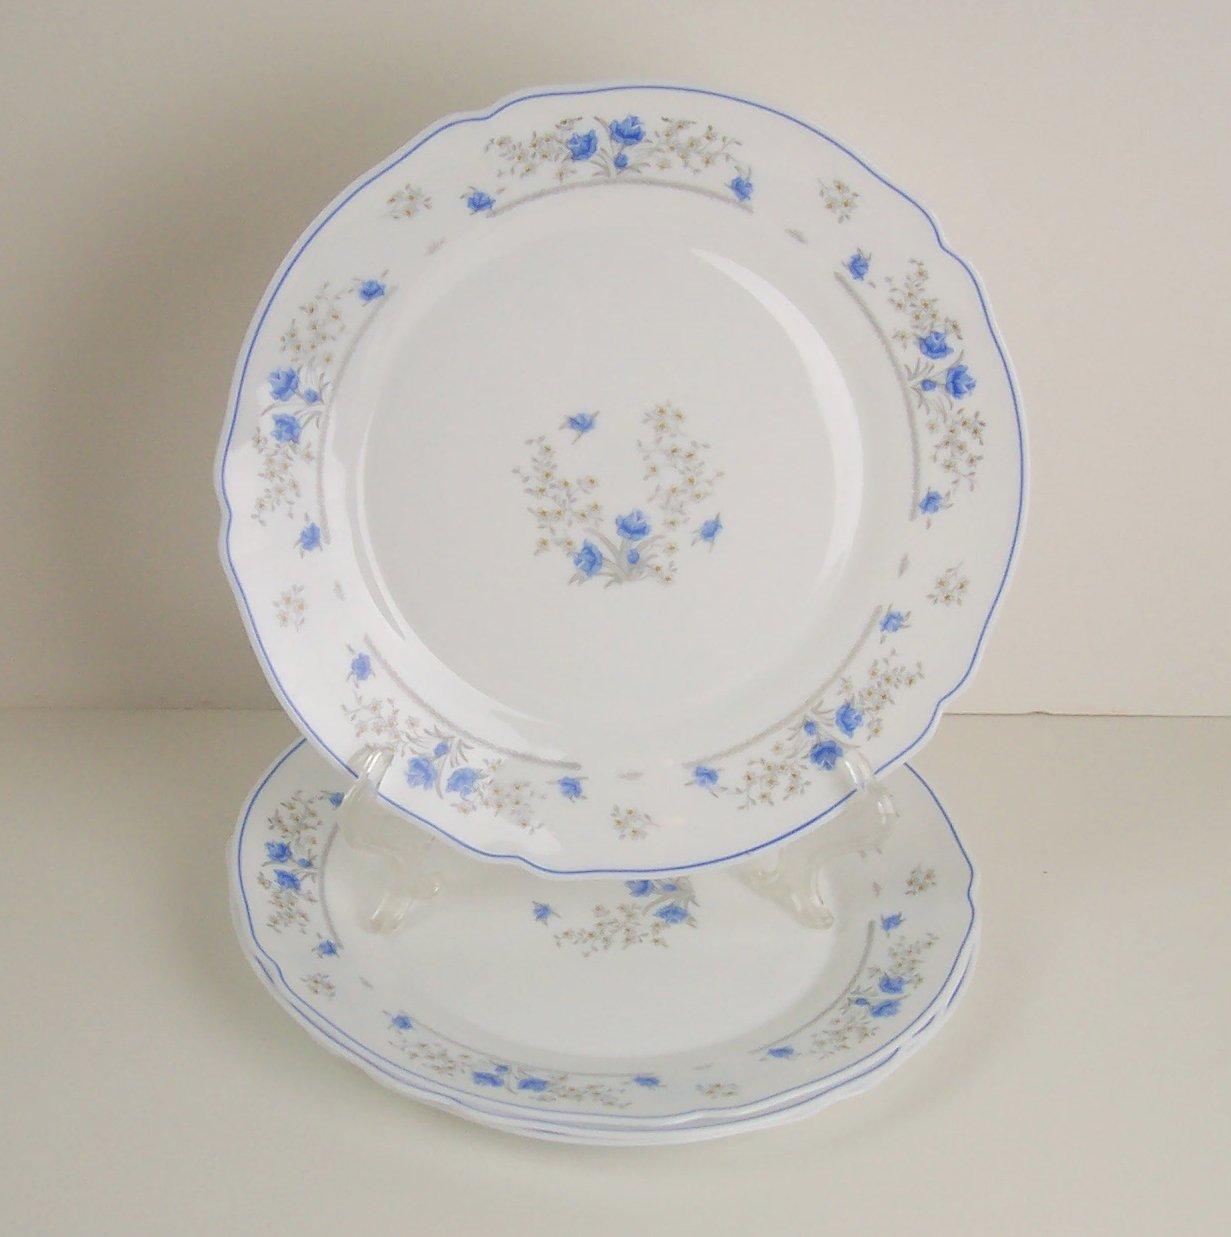 Arcopal ROMANTIQUE Set of 4 Dinner Plates Dinnerware China France White Blue Flowers microwave safe